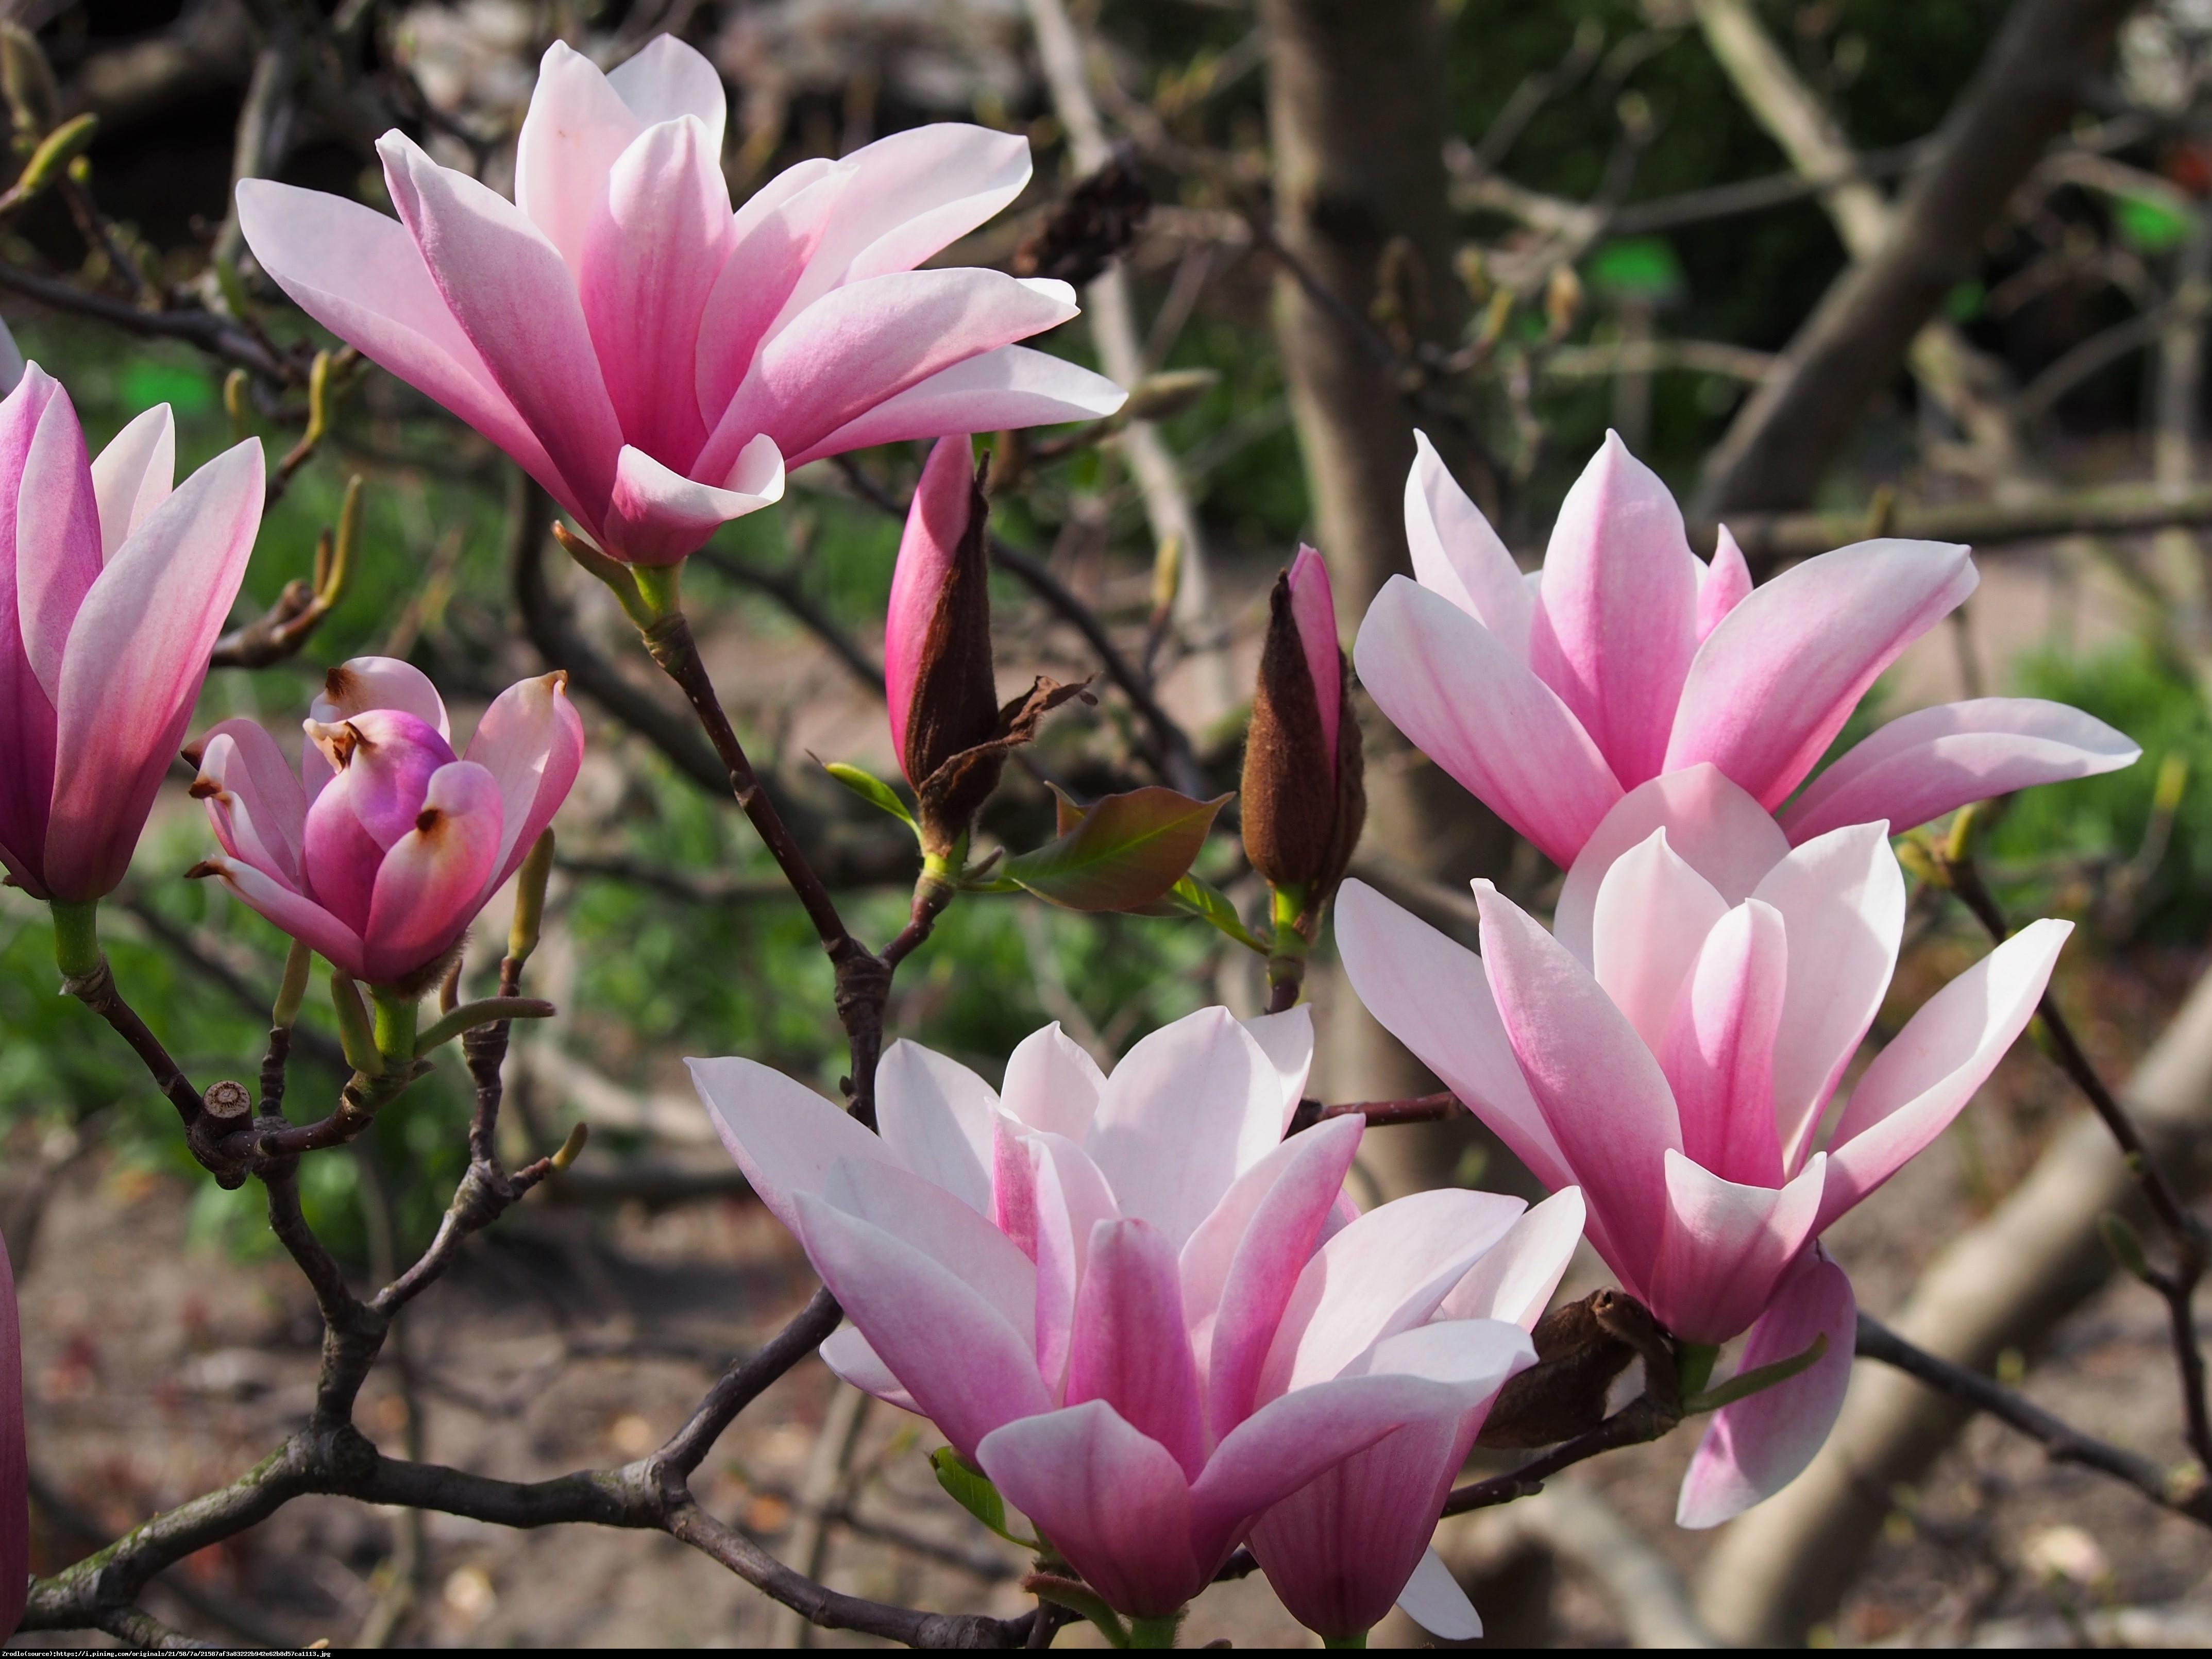 Magnolia Heaven Scent - Magnolia Heaven Scent